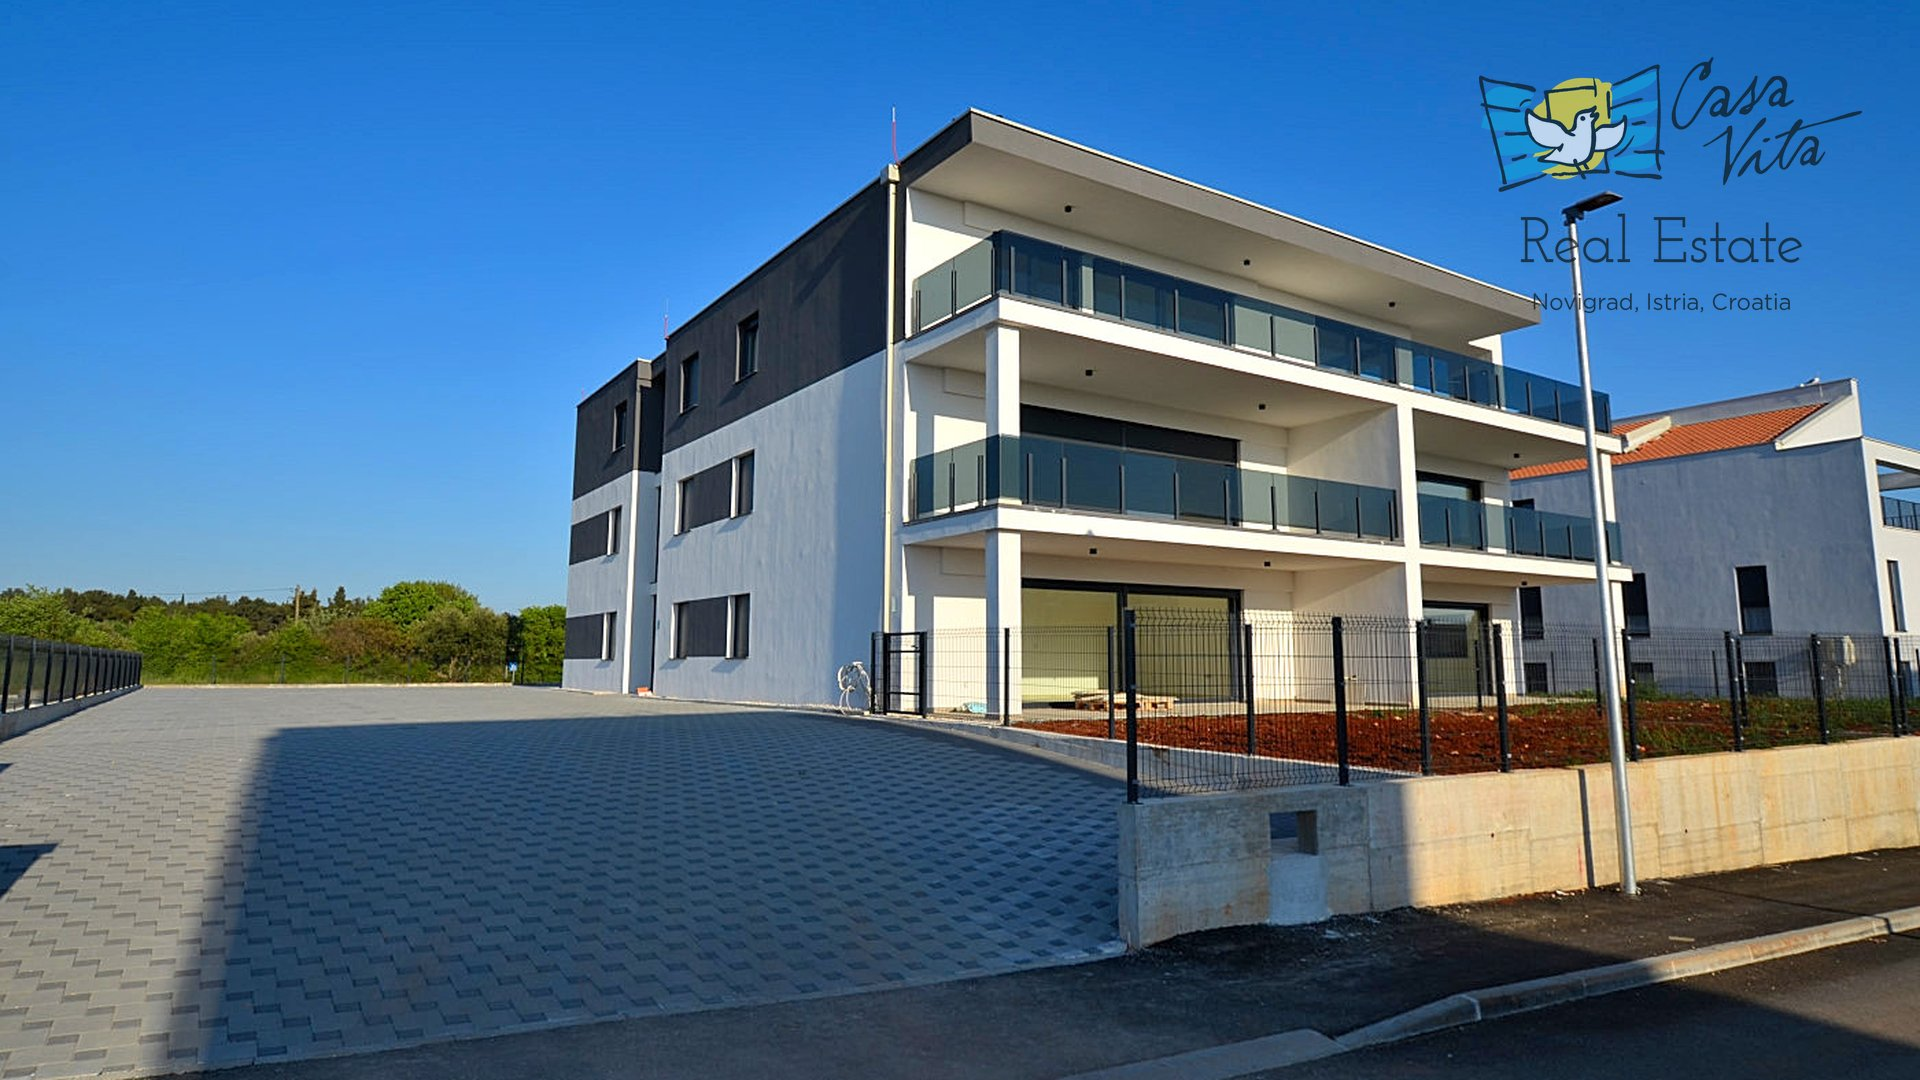 Appartamento, 111 m2, Vendita, Novigrad